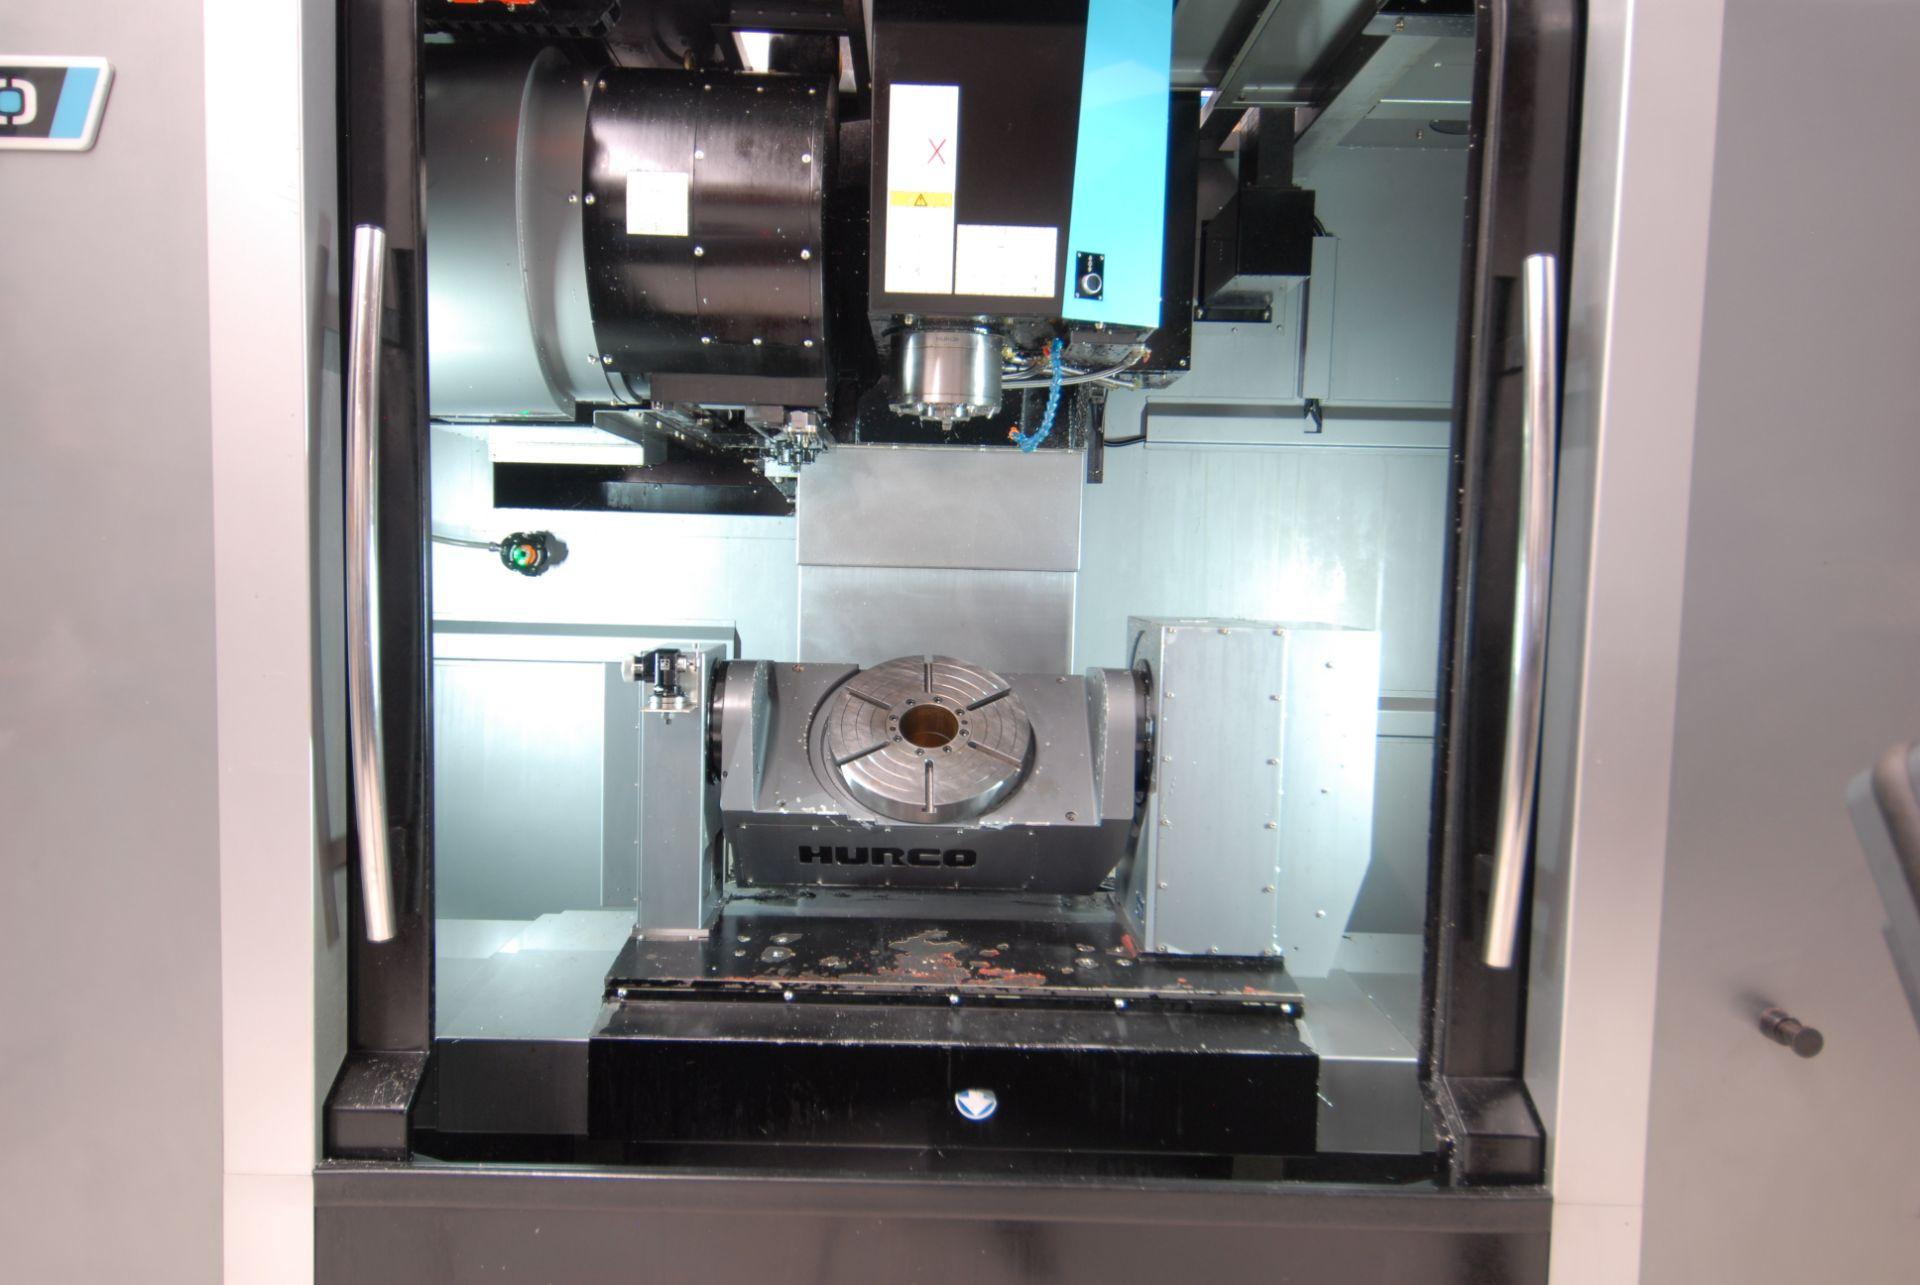 HURCO (2012) VMX42UI 5 AXIS CNC VERTICAL MACHINING CENTER WITH HURCO DUAL SCREEN CNC CONTROL, 13. - Image 2 of 20